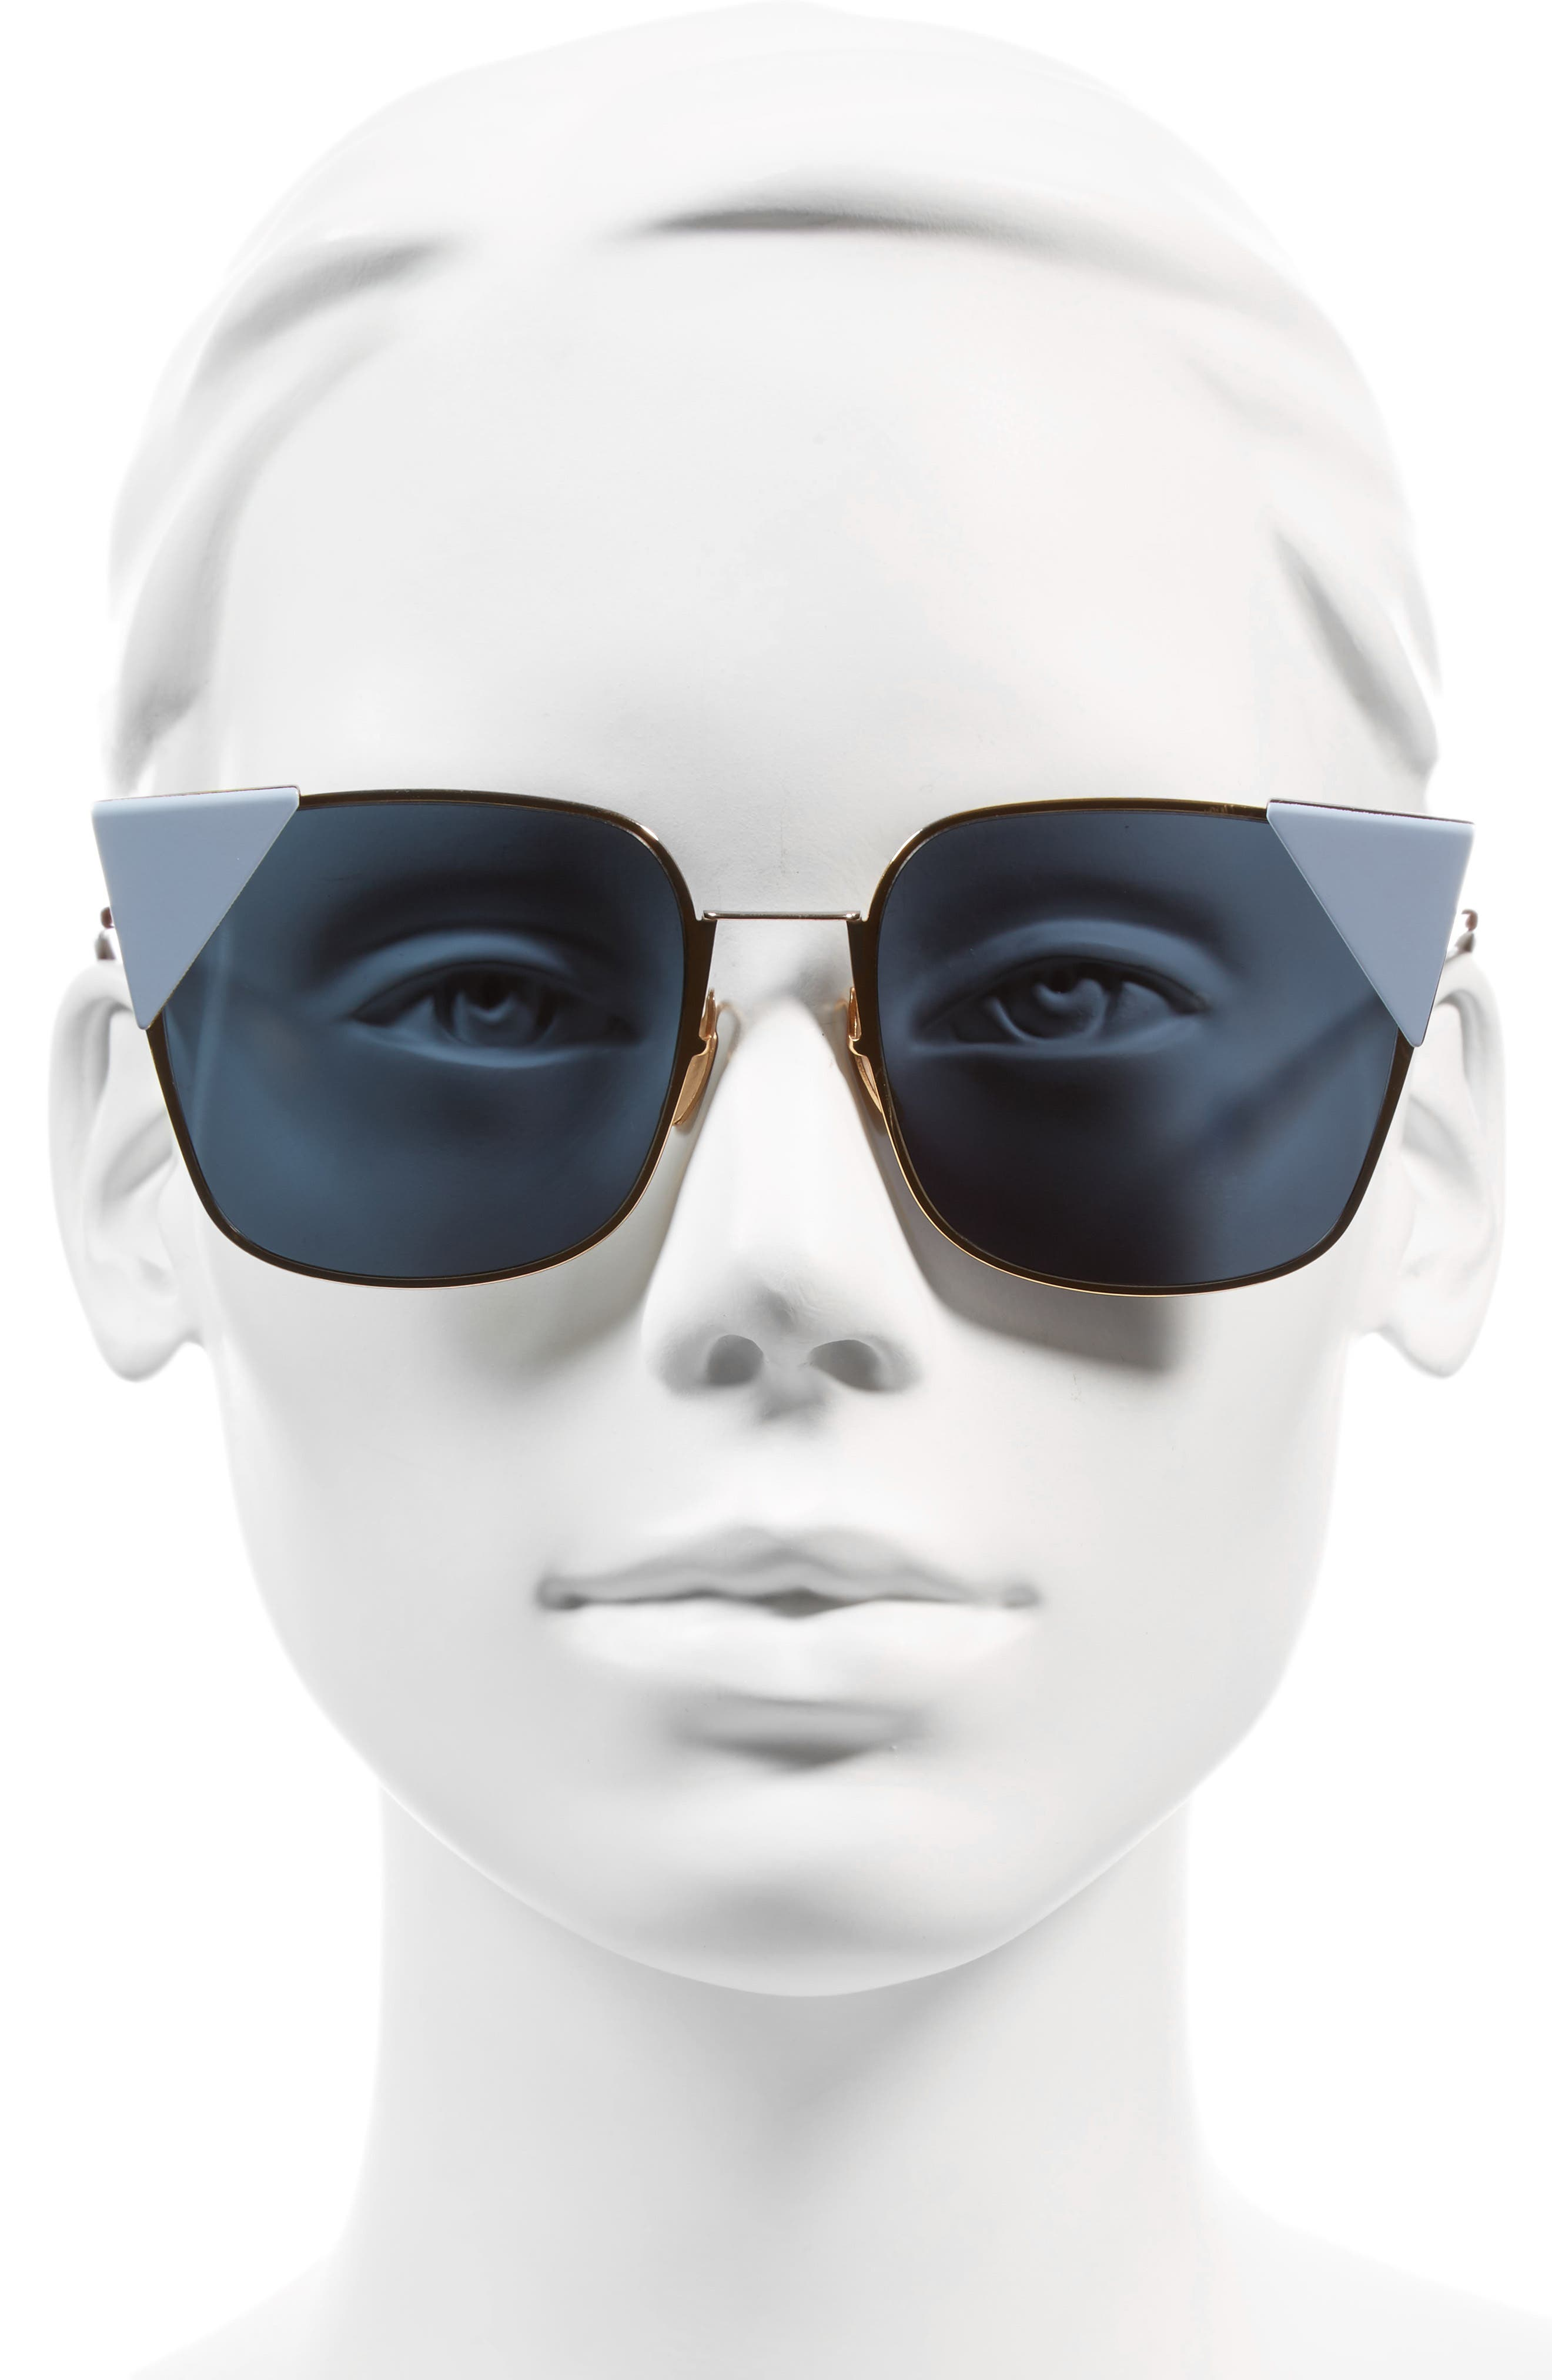 55mm Tipped Cat Eye Sunglasses,                             Alternate thumbnail 5, color,                             ROSE METALLIC GOLD